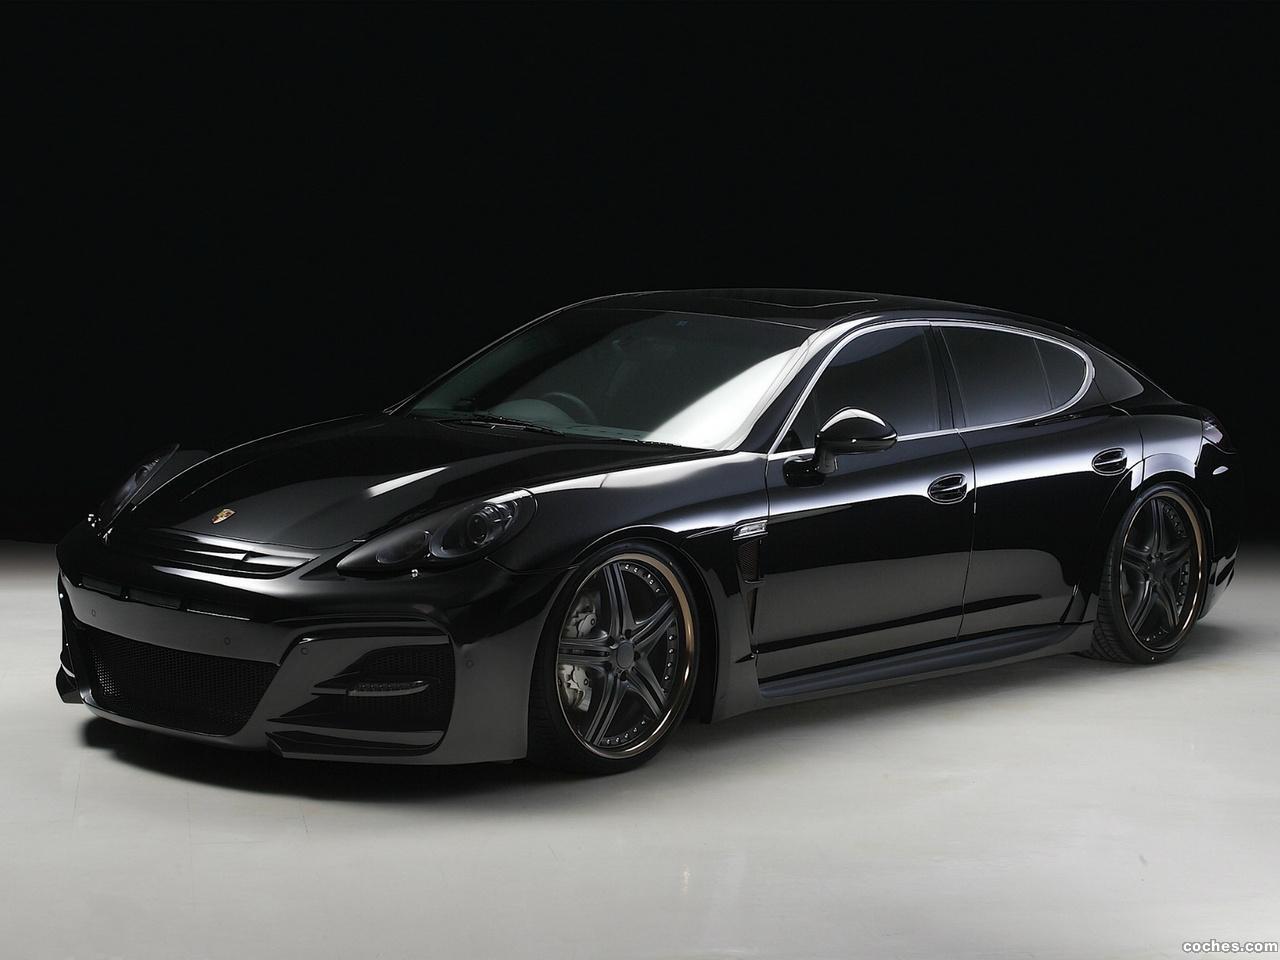 Foto 0 de Wald Porsche Panamera S Black Bisono Edition 2012